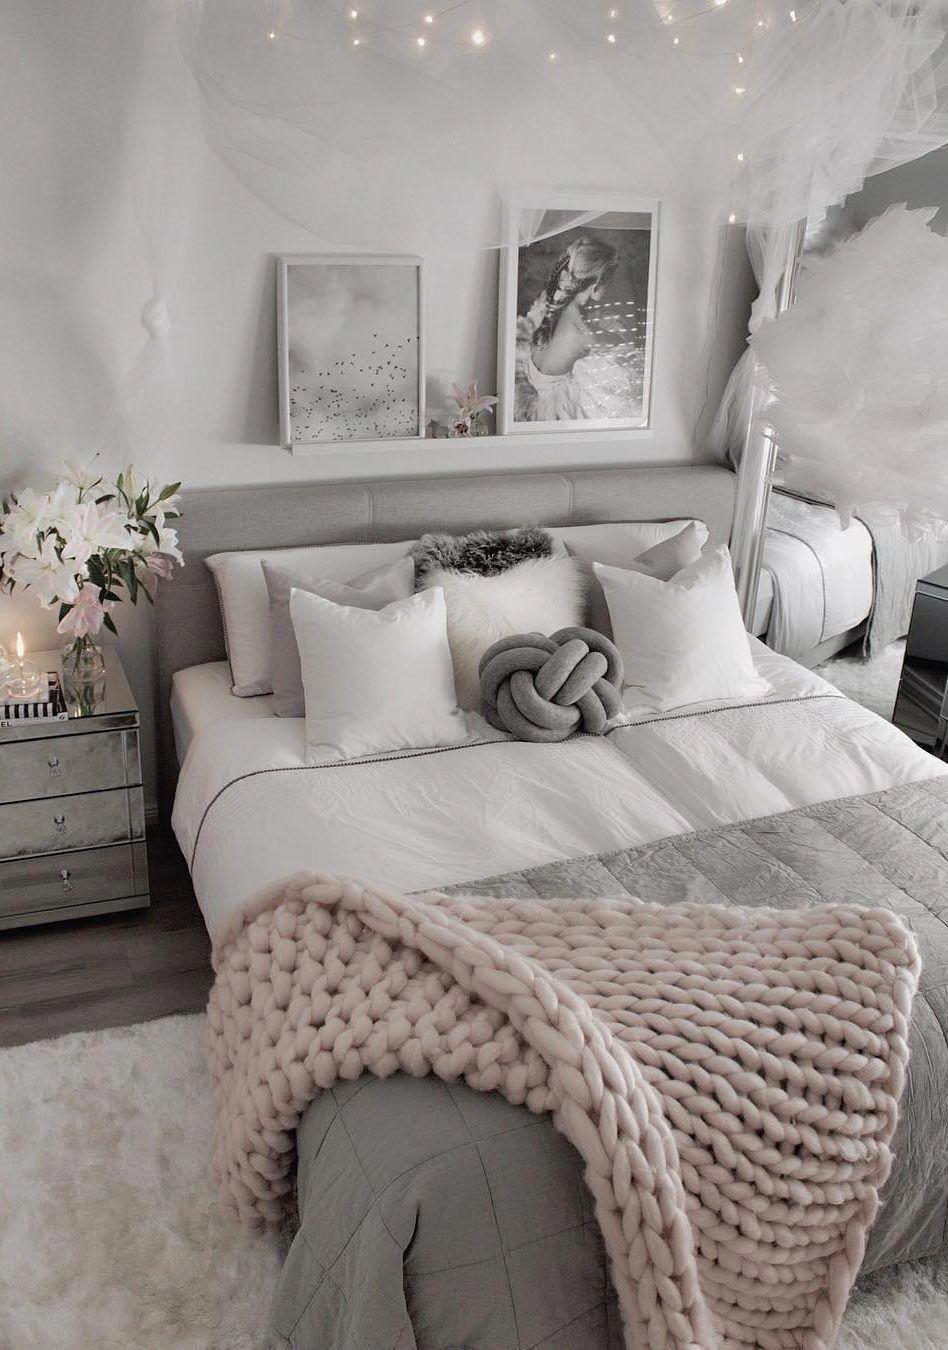 Small Great Room Designs: Great Interior Decorating Hacks